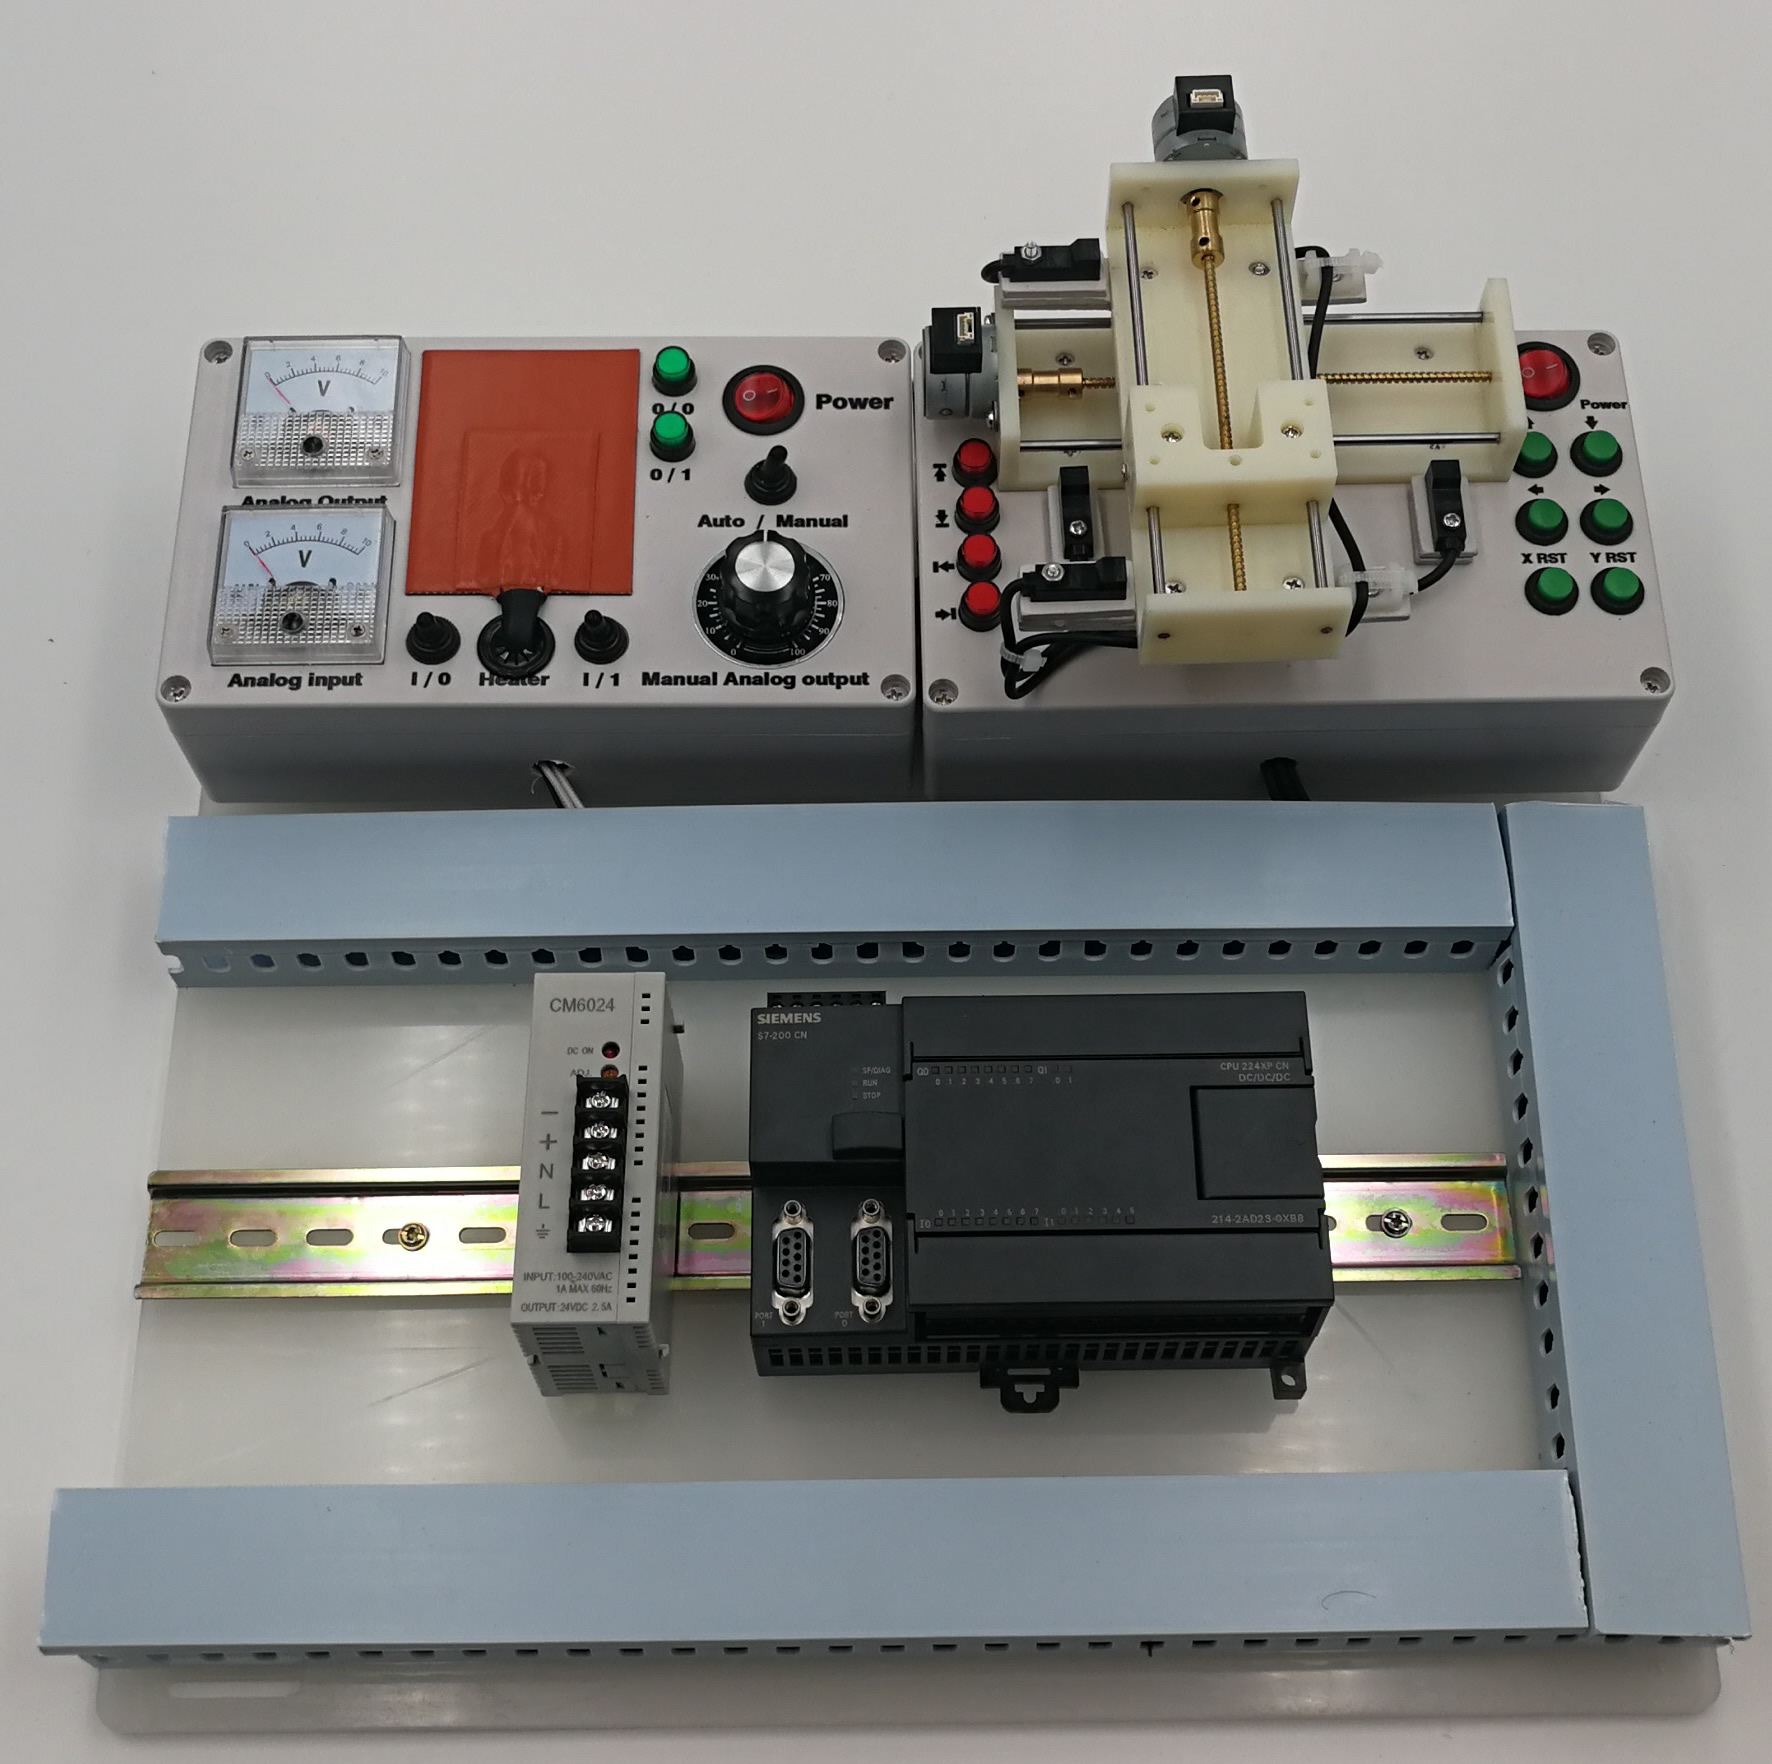 Siemens S7-200 CPU224XP Analog Stepper PLC Trainer